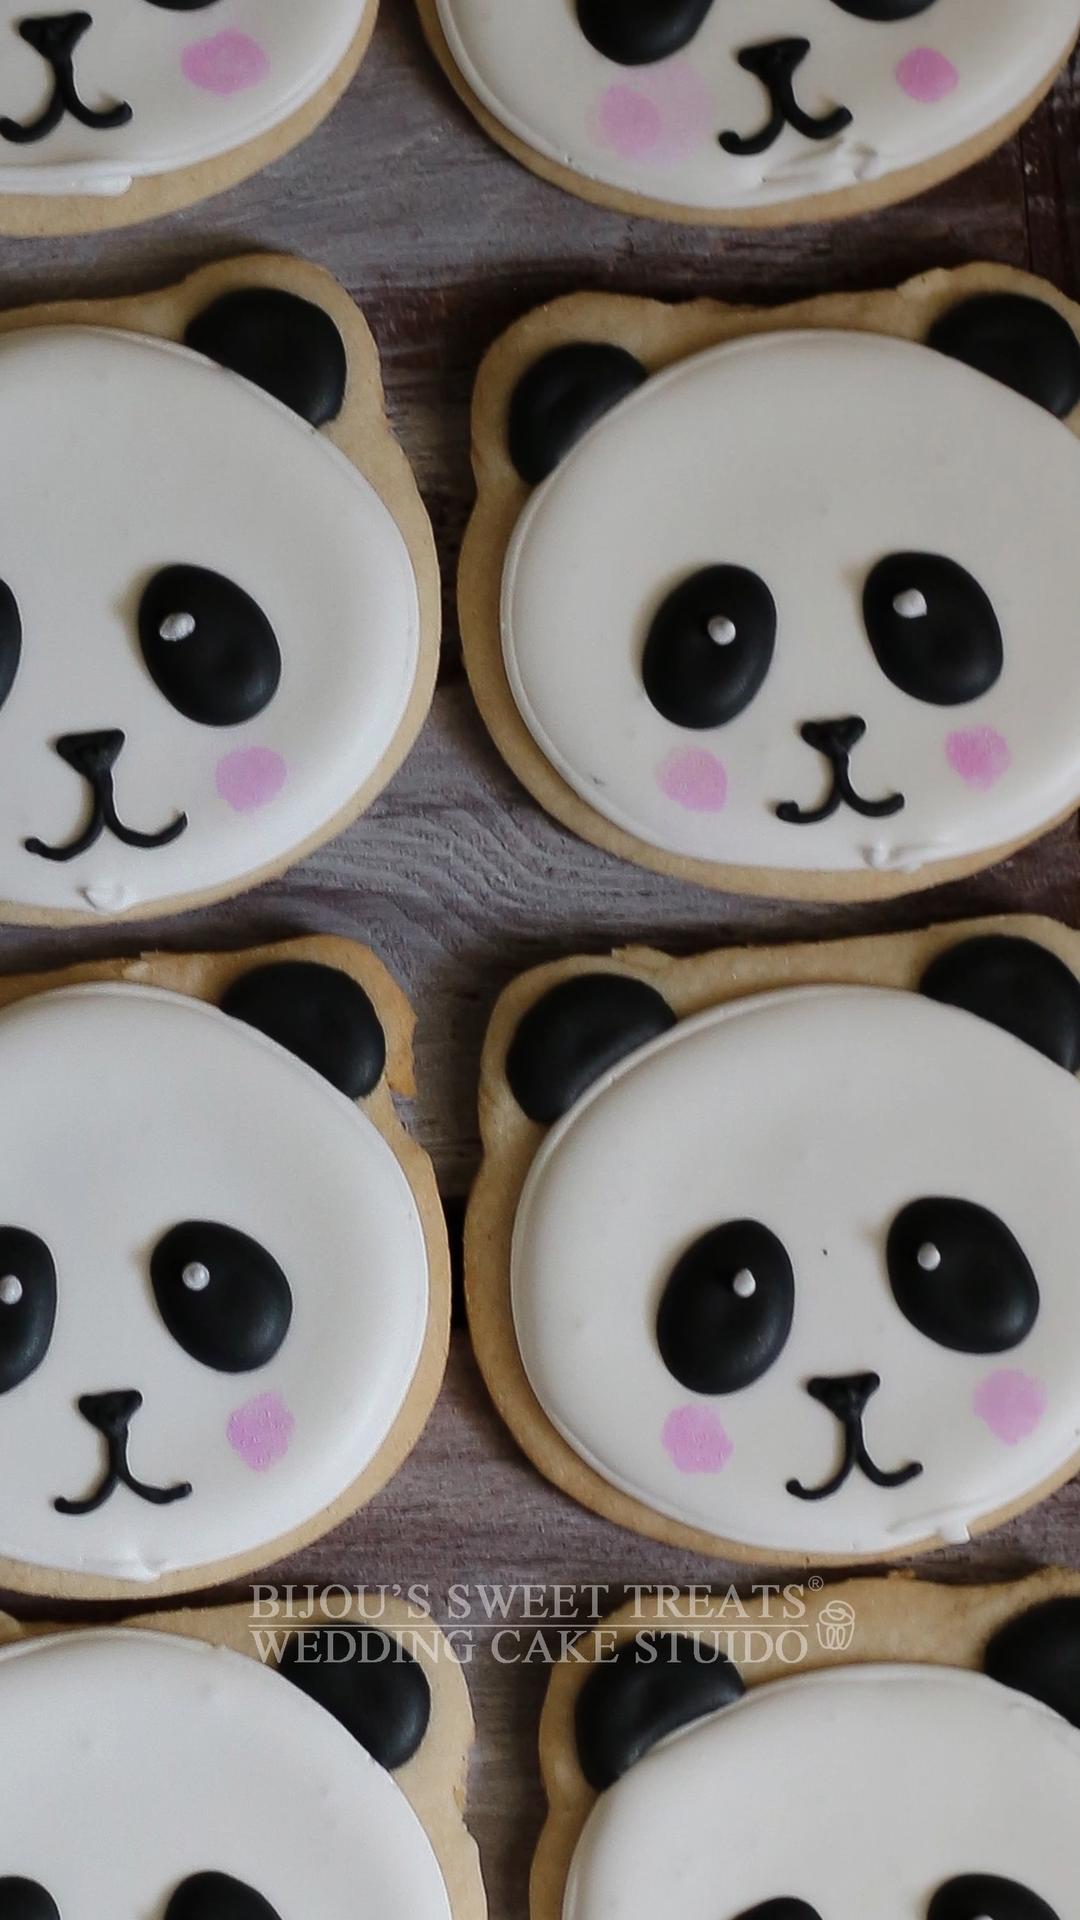 Panda Cookie Favors by Bijous Sweet Treats wedding cake studio